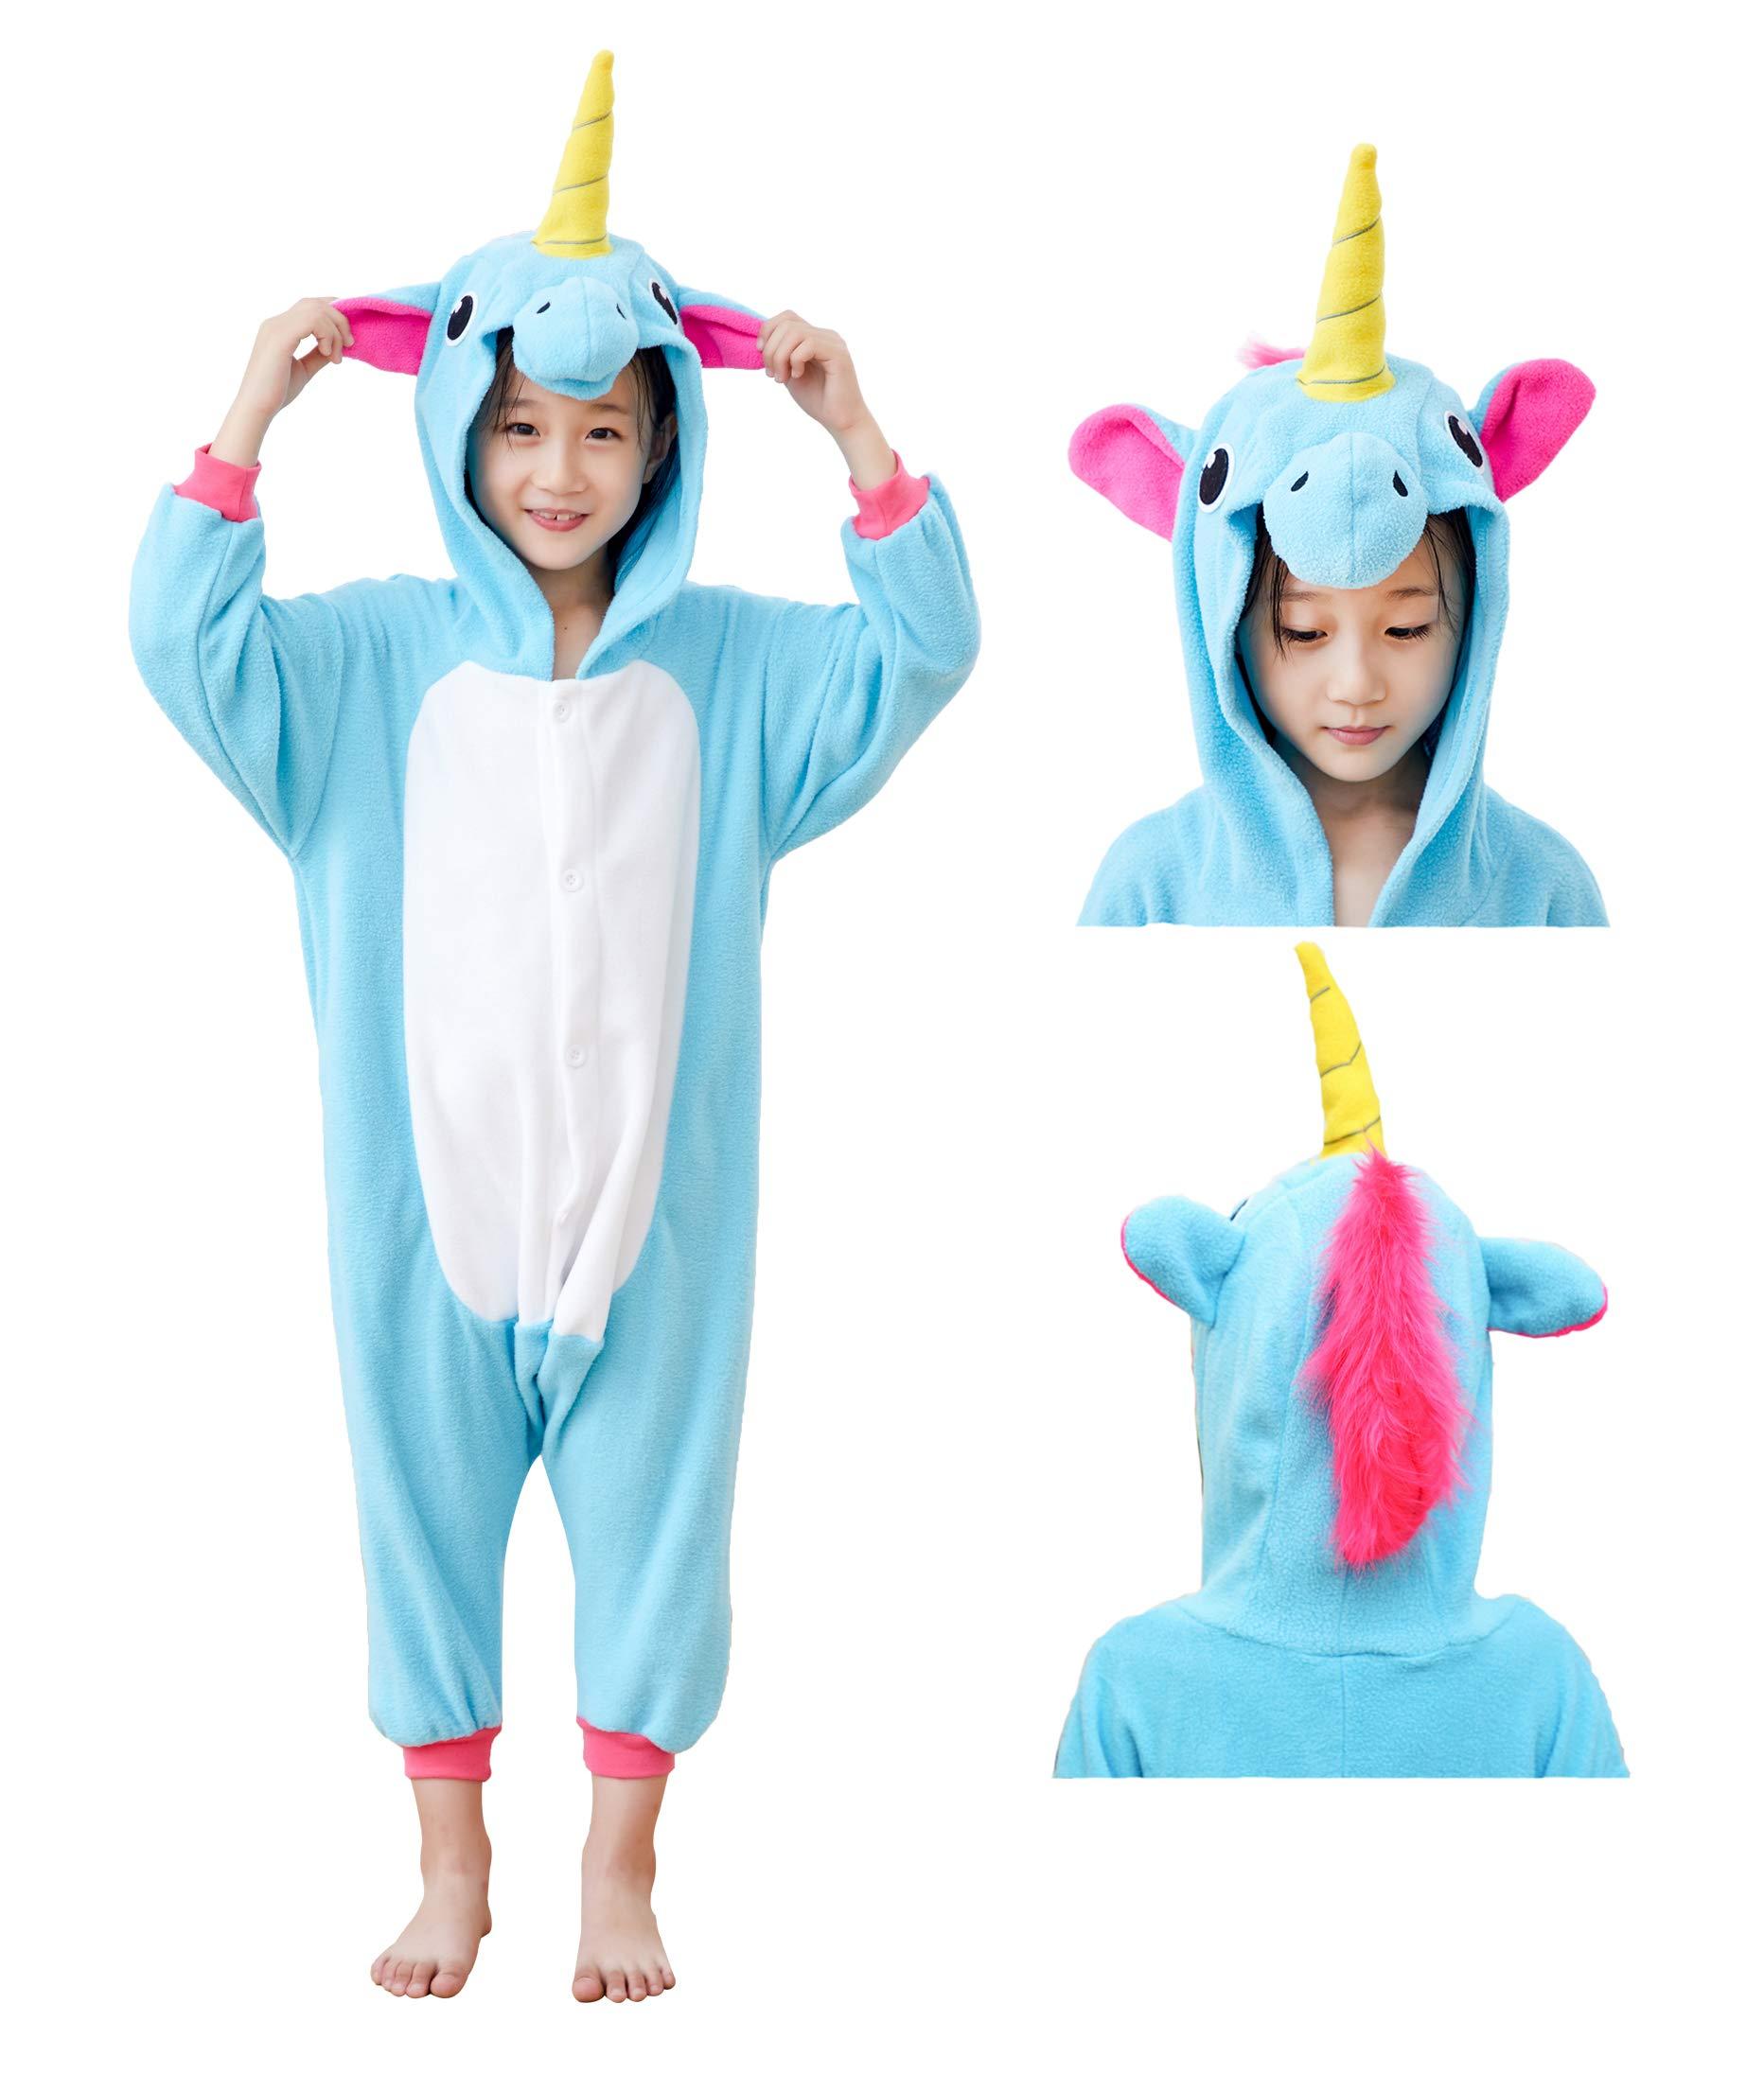 Mybei Unisex Kids Unicorn Onesie Cosplay Pajamas,Fleece One Piece Animal Costume for Boys Girls 10-12